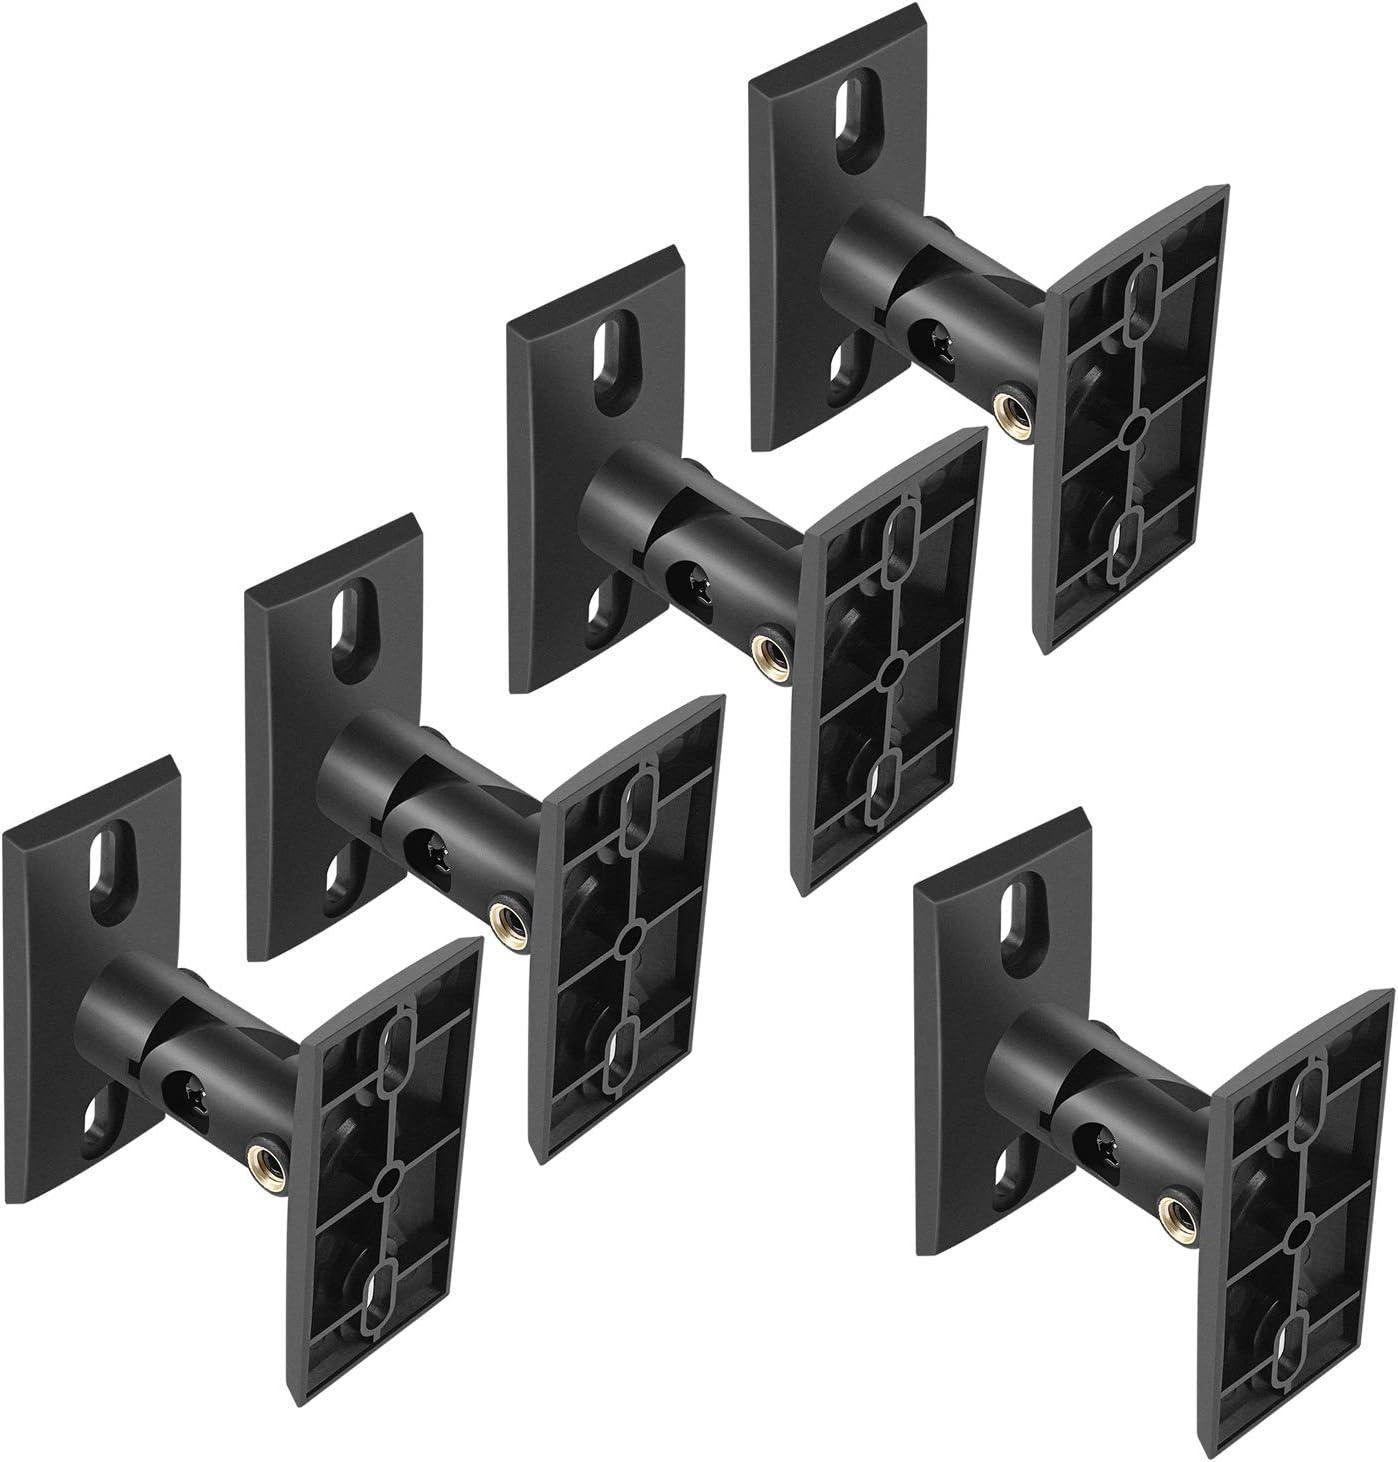 PERLESMITH Speaker Mounts - Universal Satellite Speaker Wall Brackets, 10  Pack - Adjustable Tilt and Swivel for Large Surround Sound Speakers - for